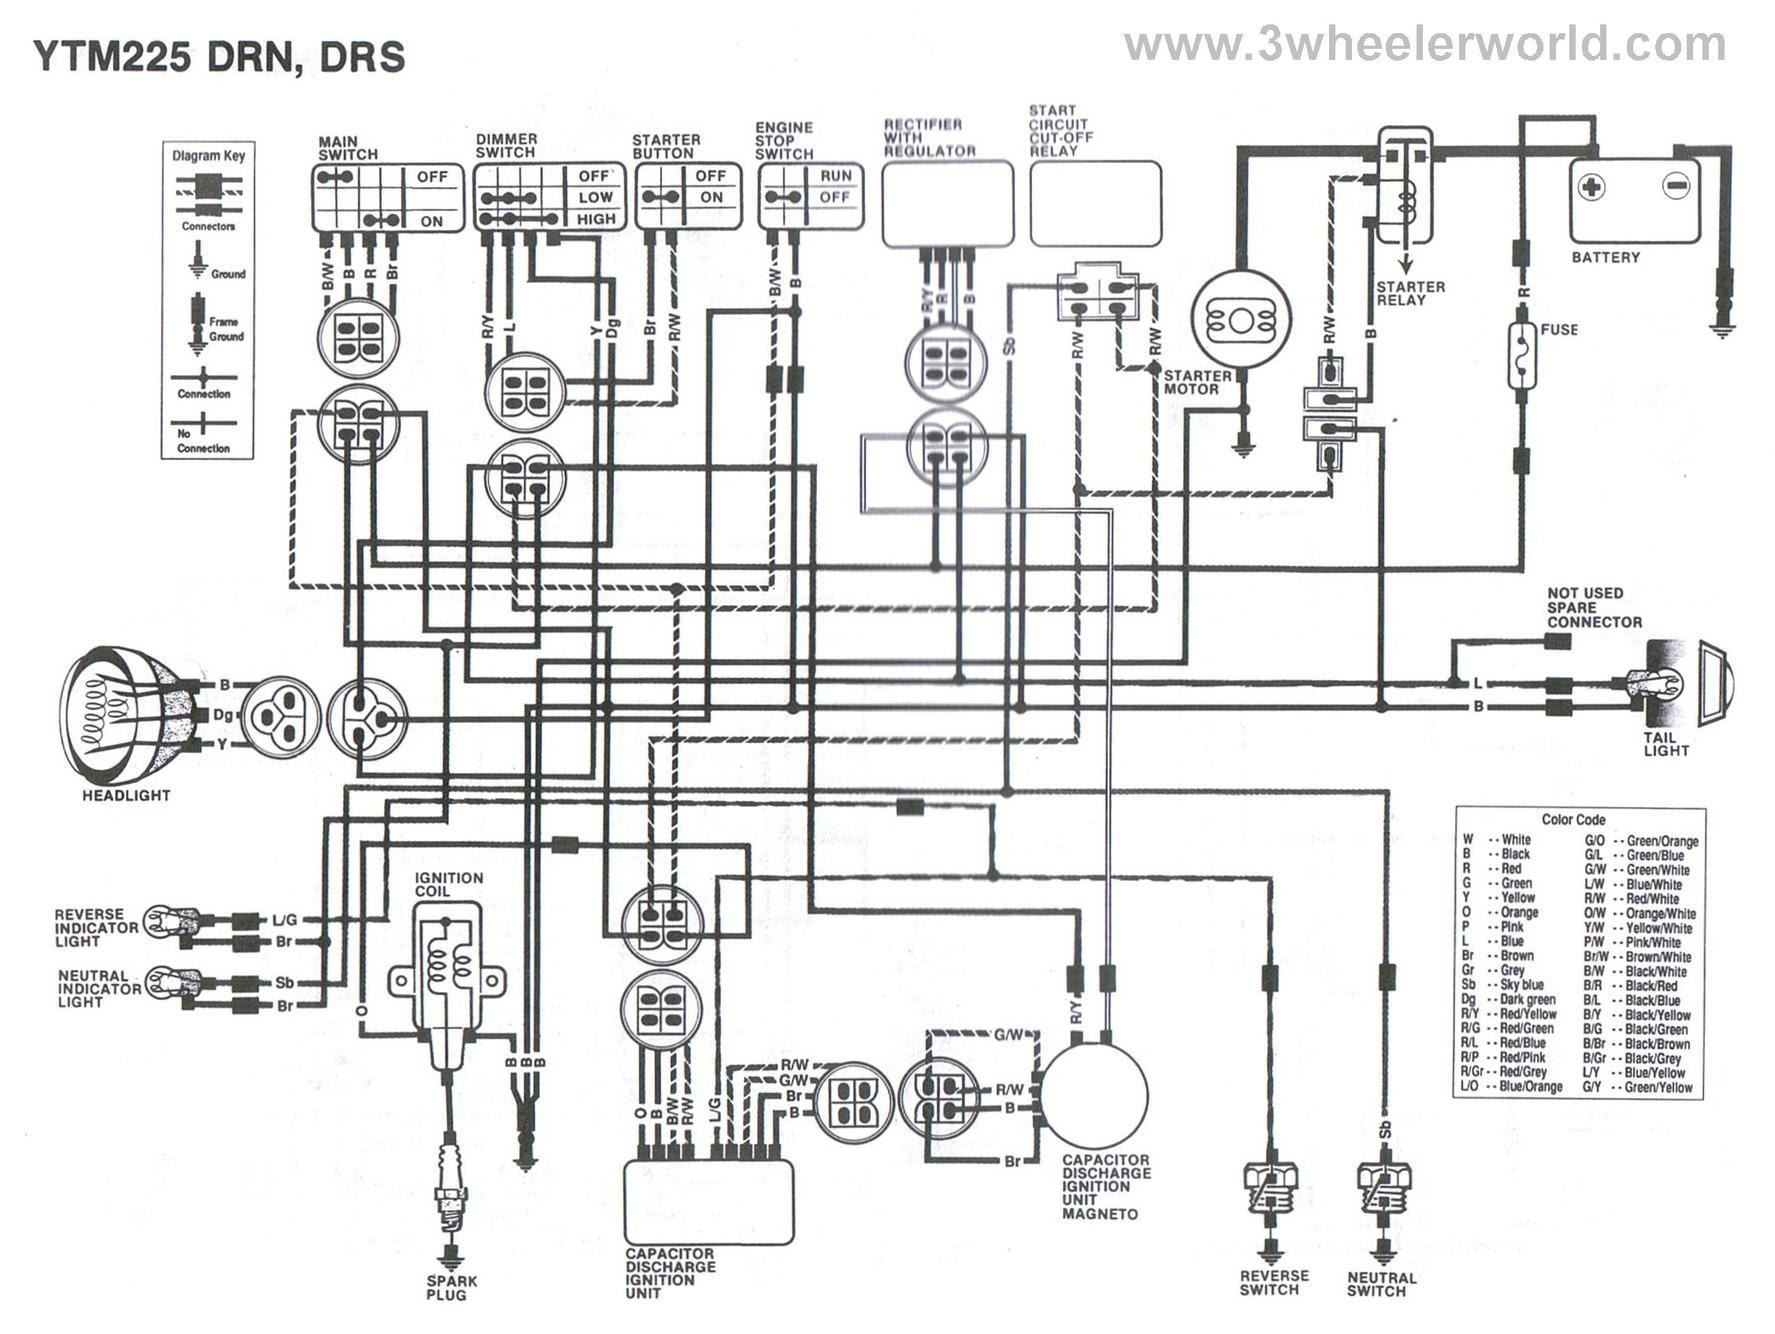 hight resolution of johnson 40 hp wiring diagram johnson 50 hp wiring diagram johnson 35 hp wiring